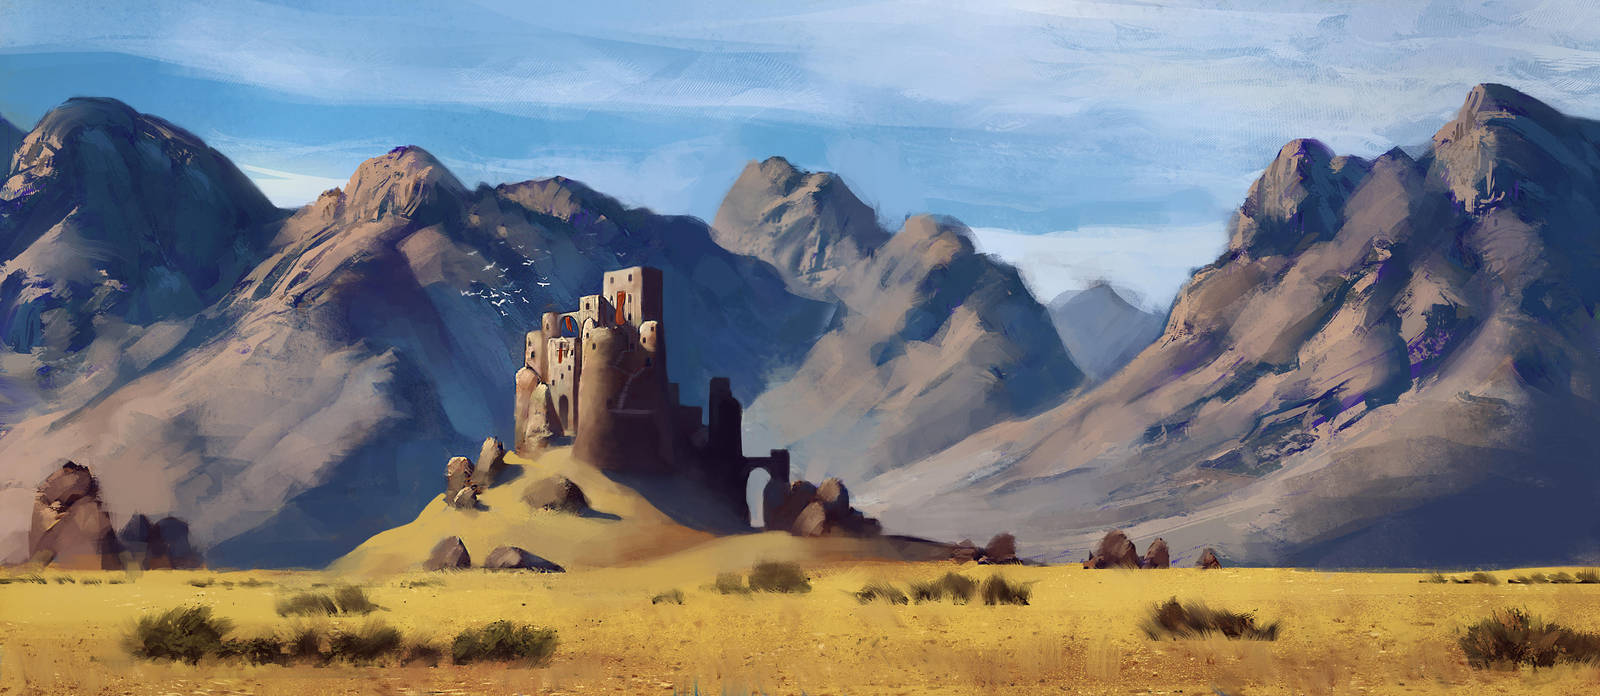 Desert Outpost III by Fleret